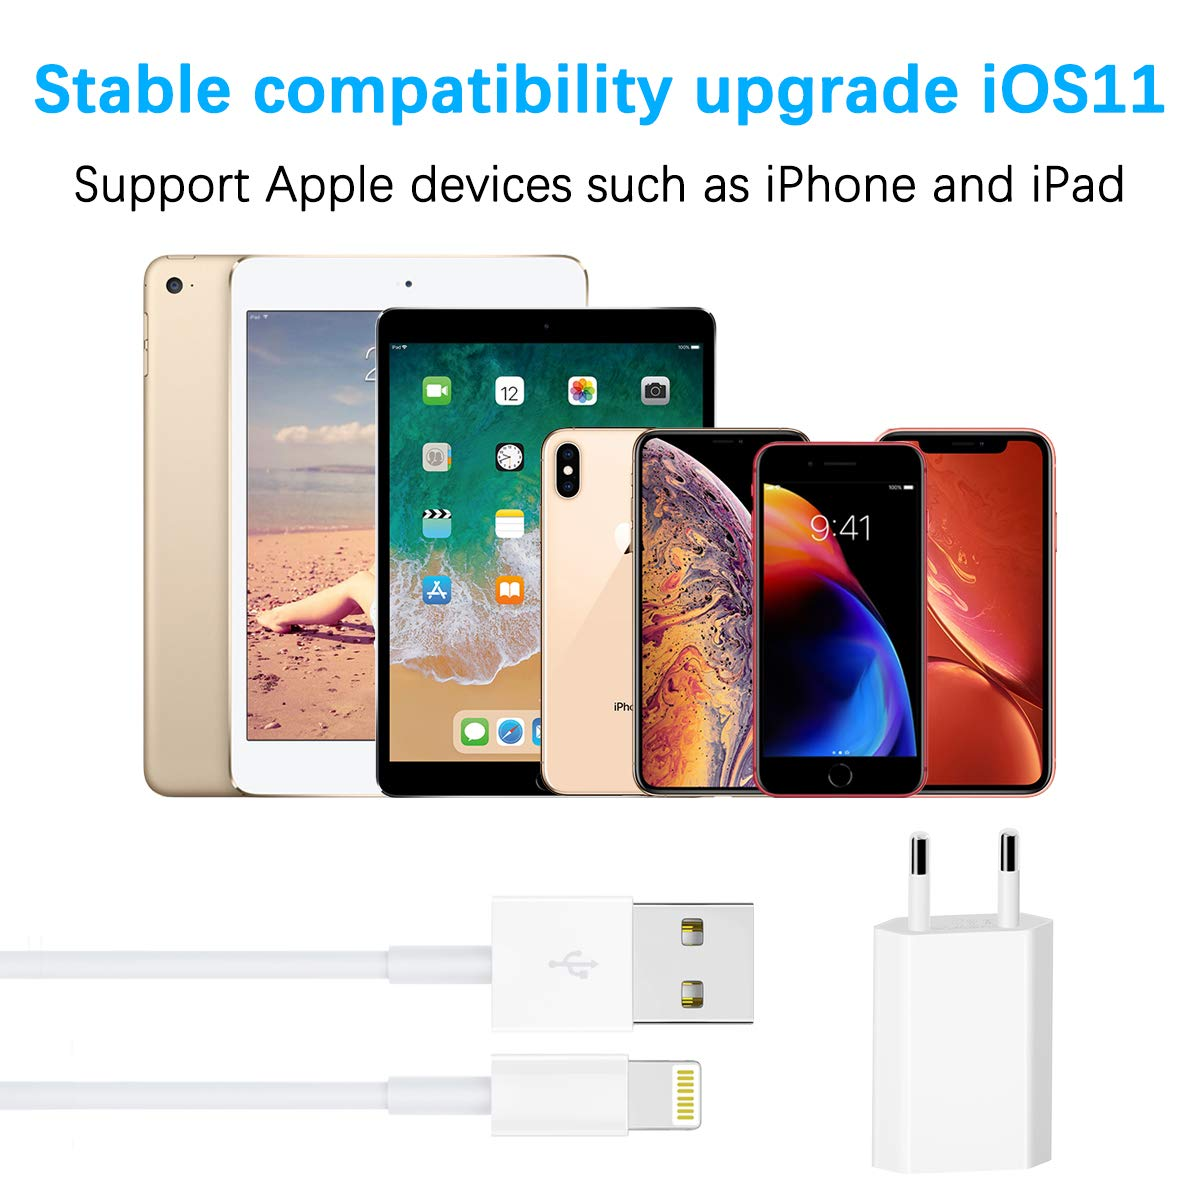 2-Pack-1M Adaptateur USB Universel Mural /& Chargeur Phone pour iPhone XS,XR,XS Max,X,8,8 Plus,7,7 Plus 6s Plus 5s WUXIAN Chargeurs Secteur with C/âble MFI certifi/é